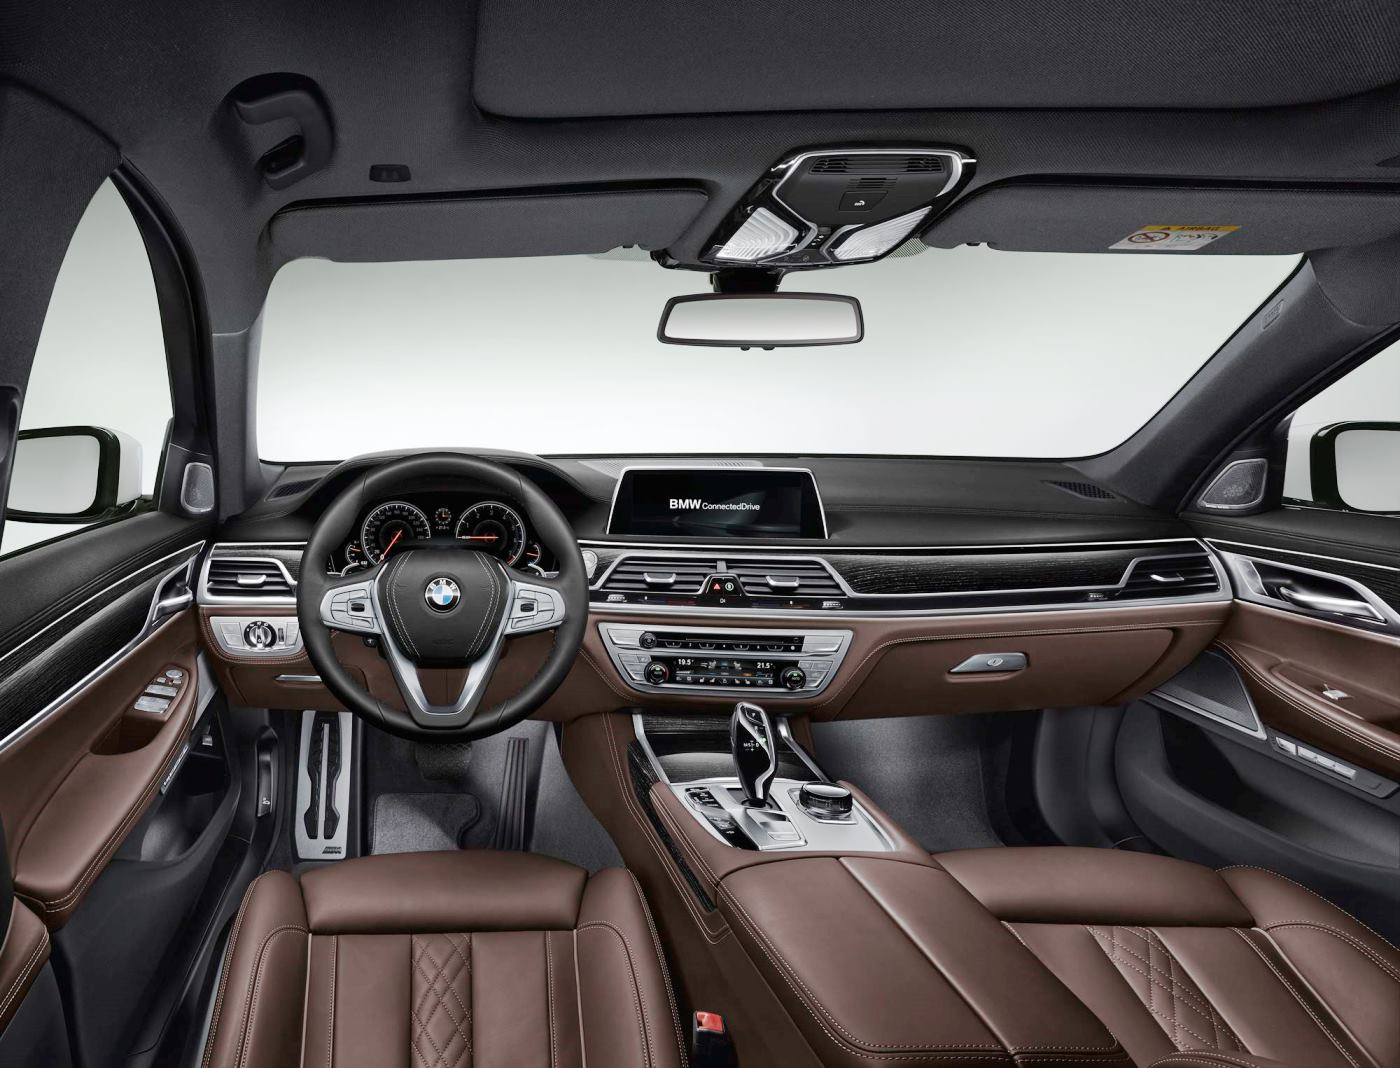 2016 BMW 7 Series Interior Photos 14